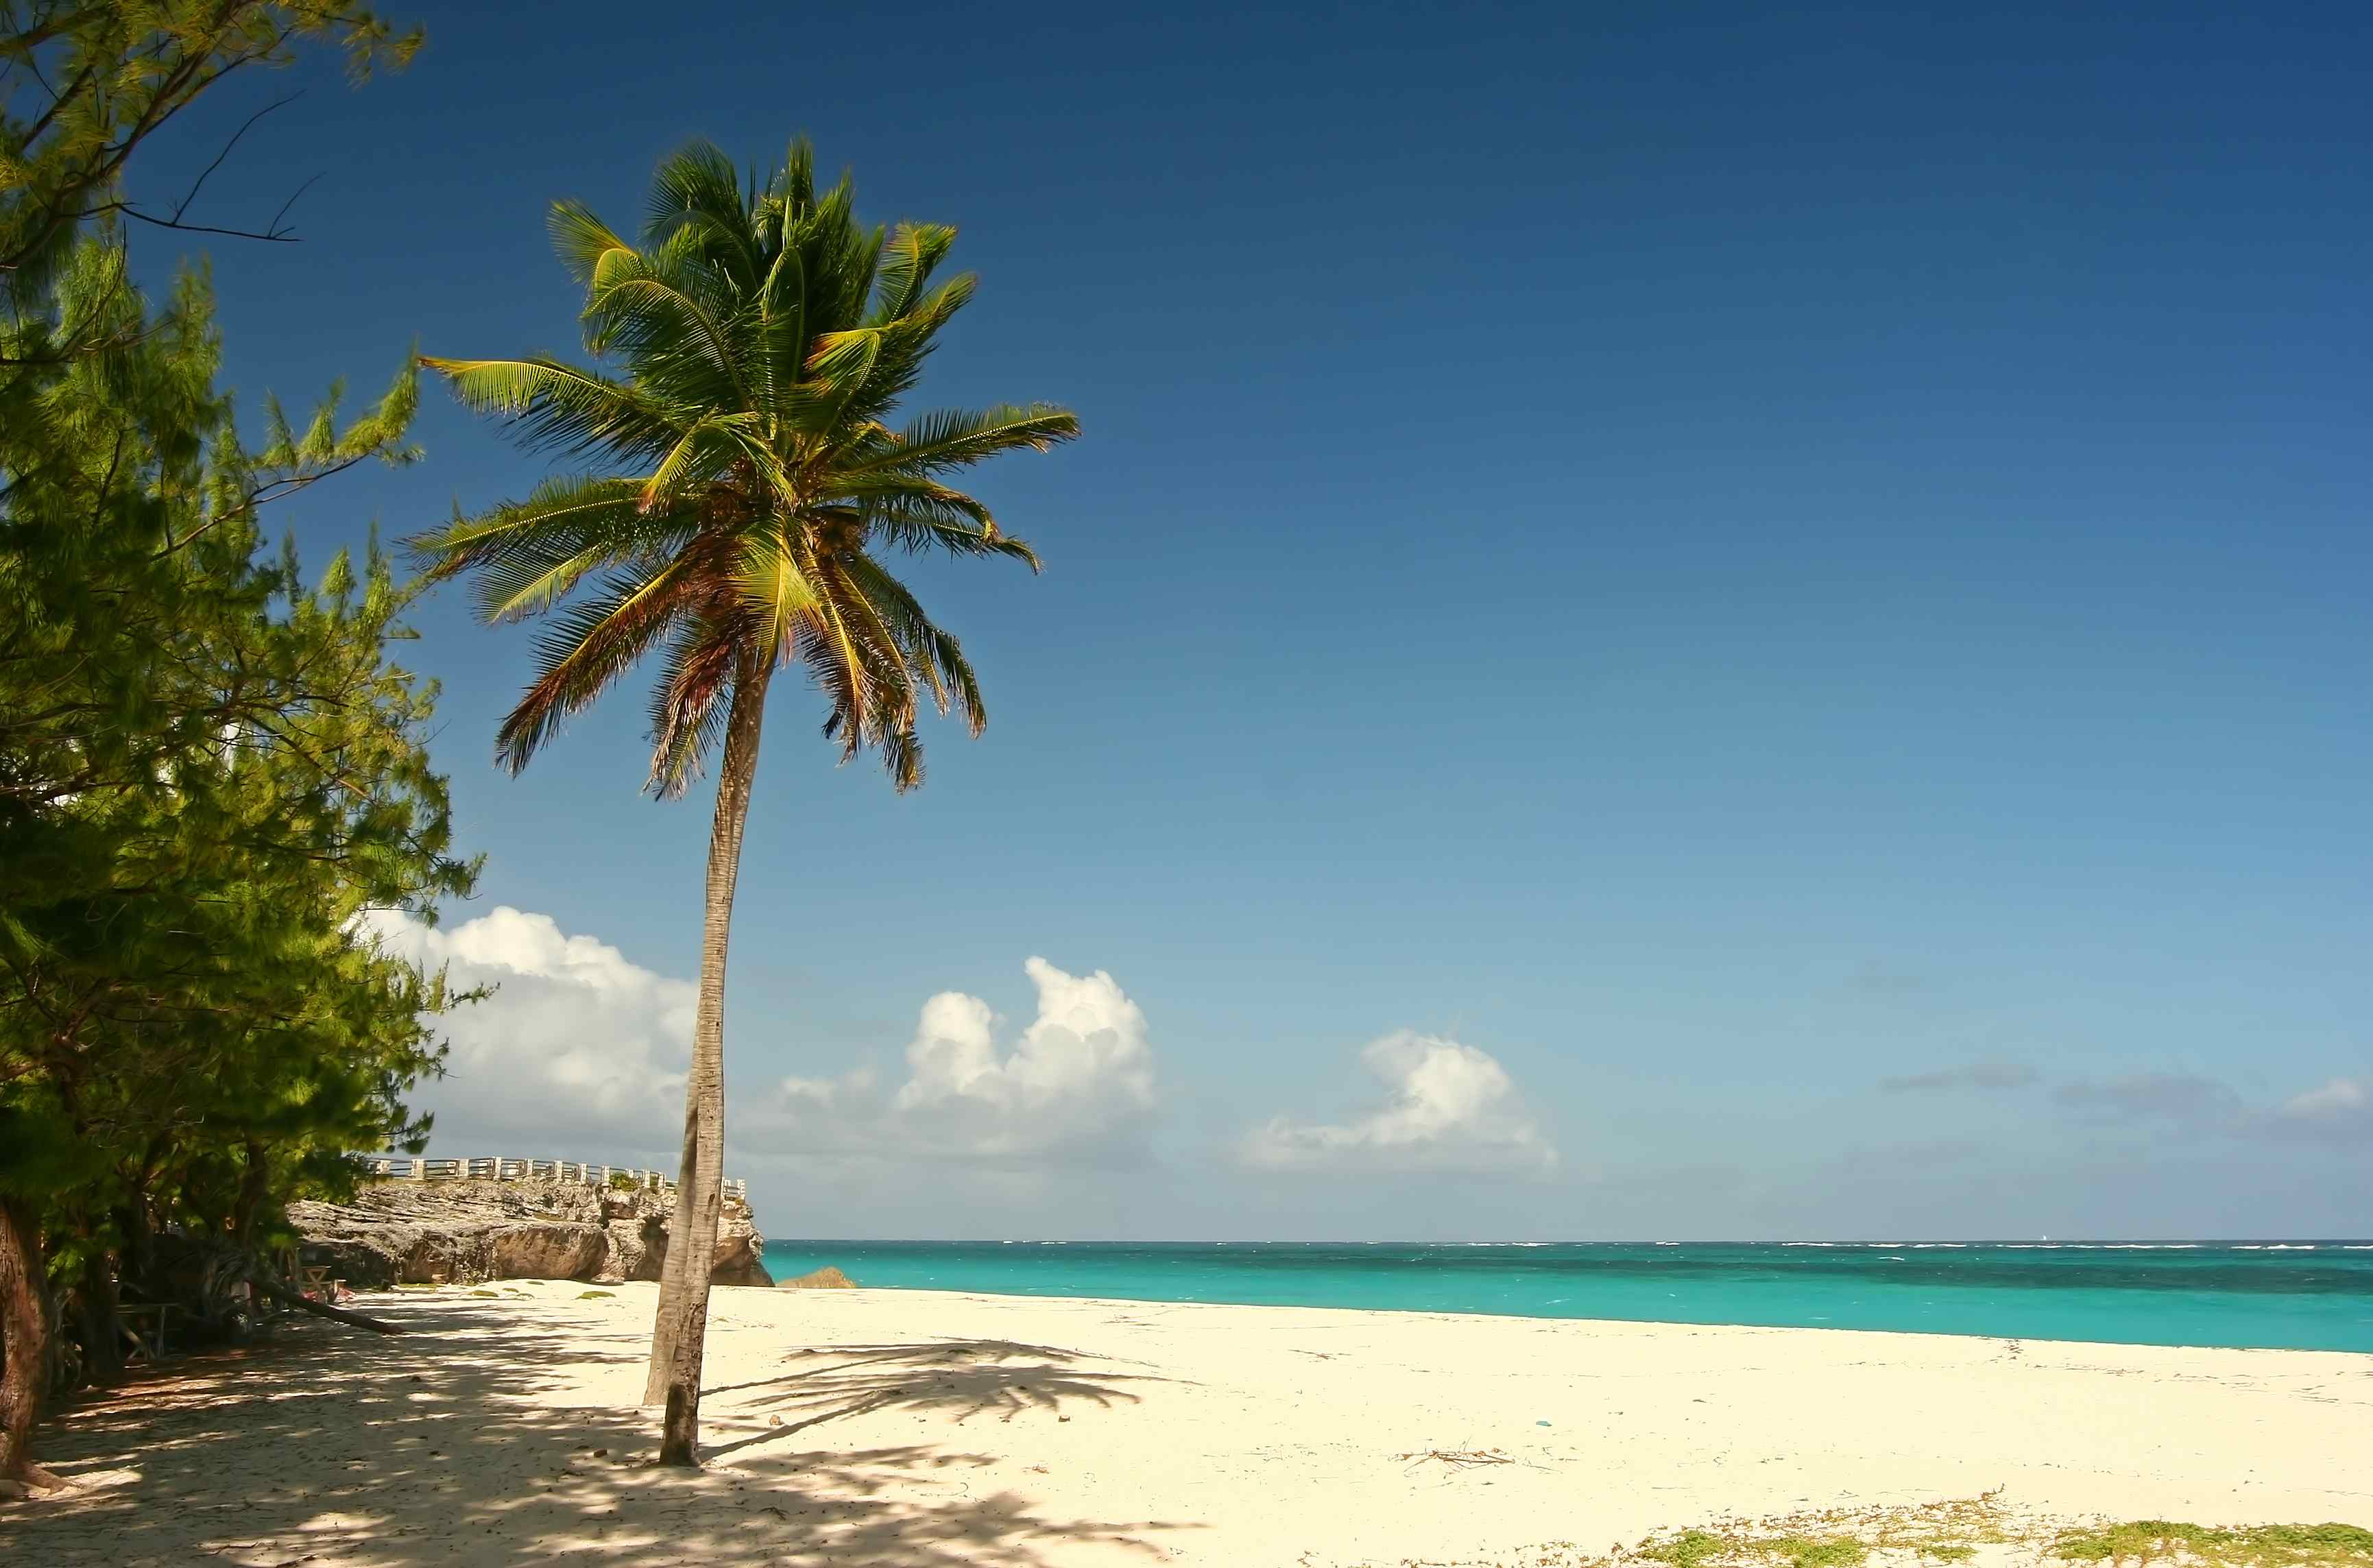 Strand Brustverbesserung Palme